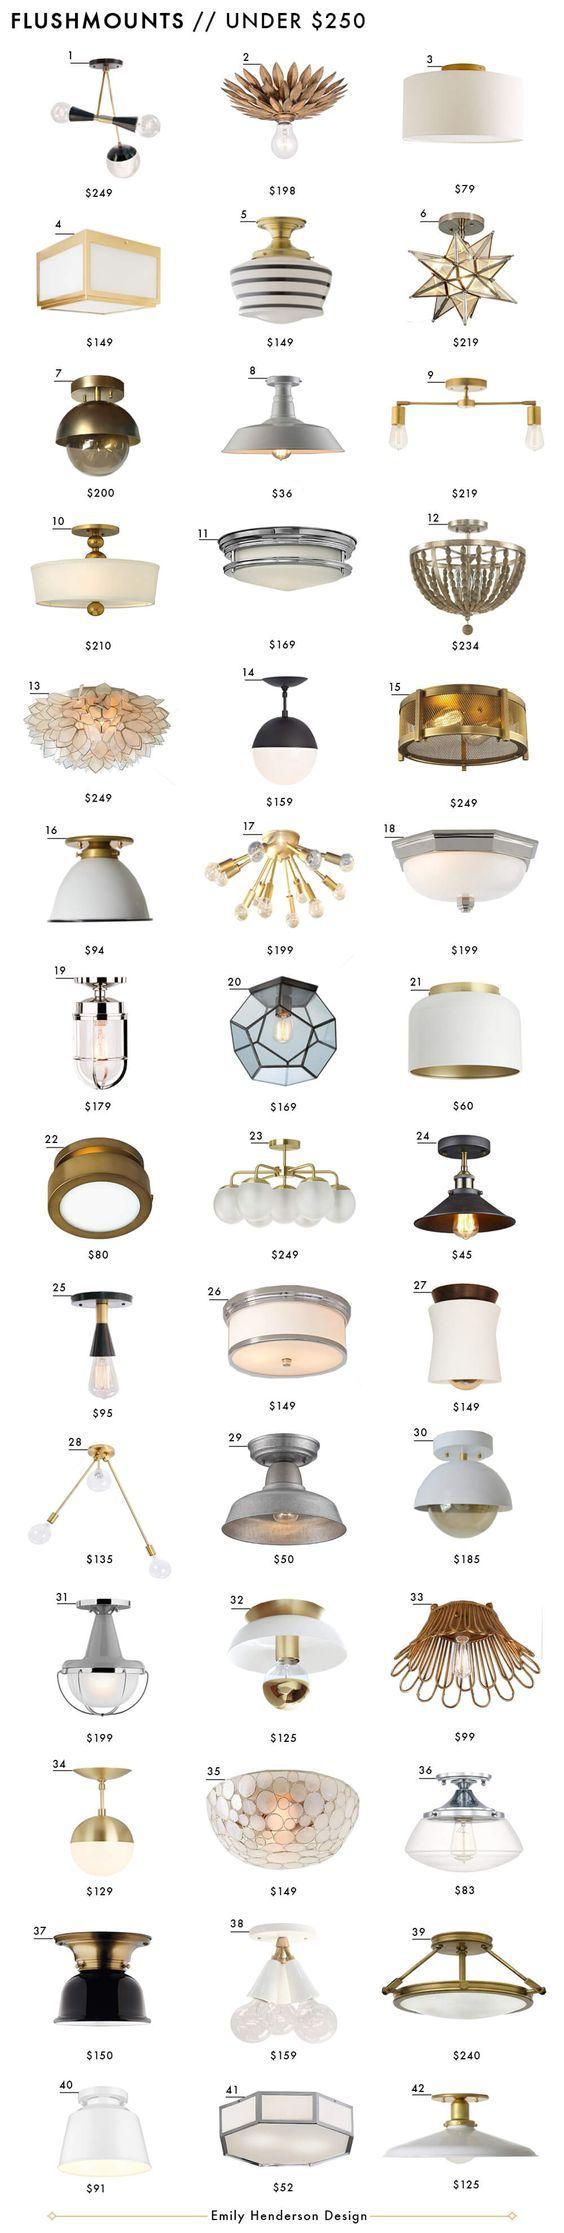 35 best lighting images on pinterest chandeliers ceiling flushmount and semi flushmount roundup hall light arubaitofo Images